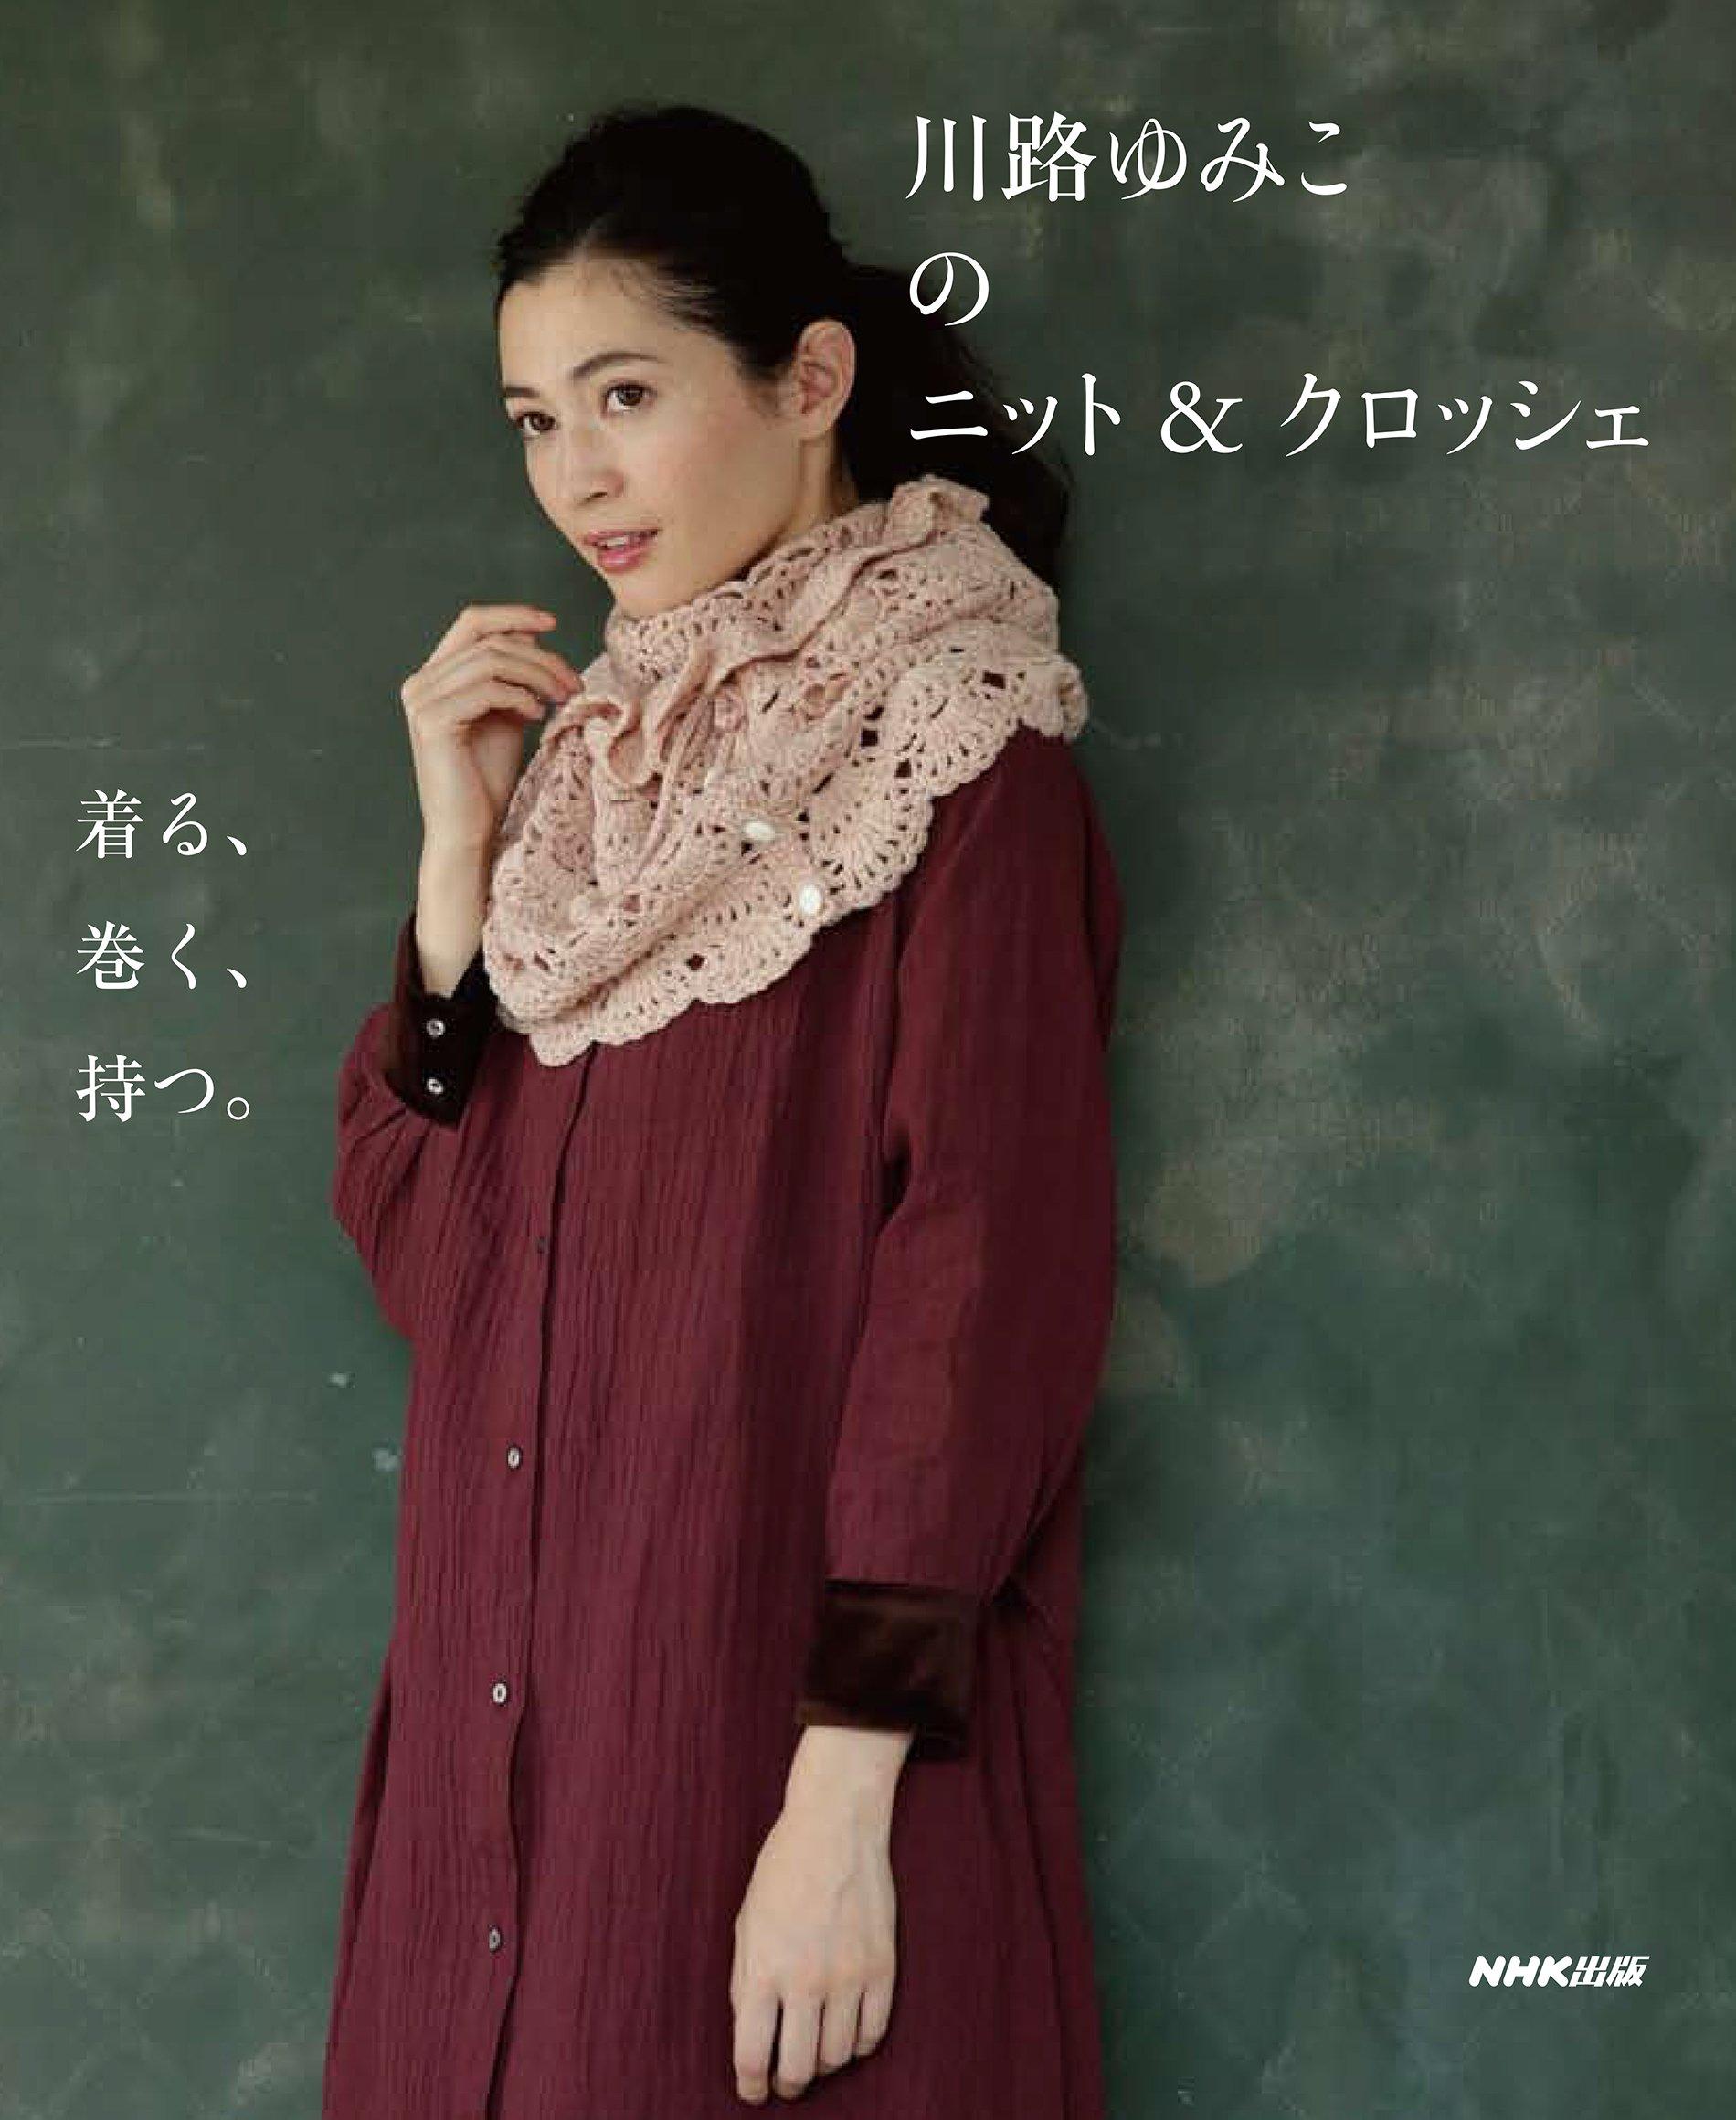 Yumiko Kawato knit&crochet